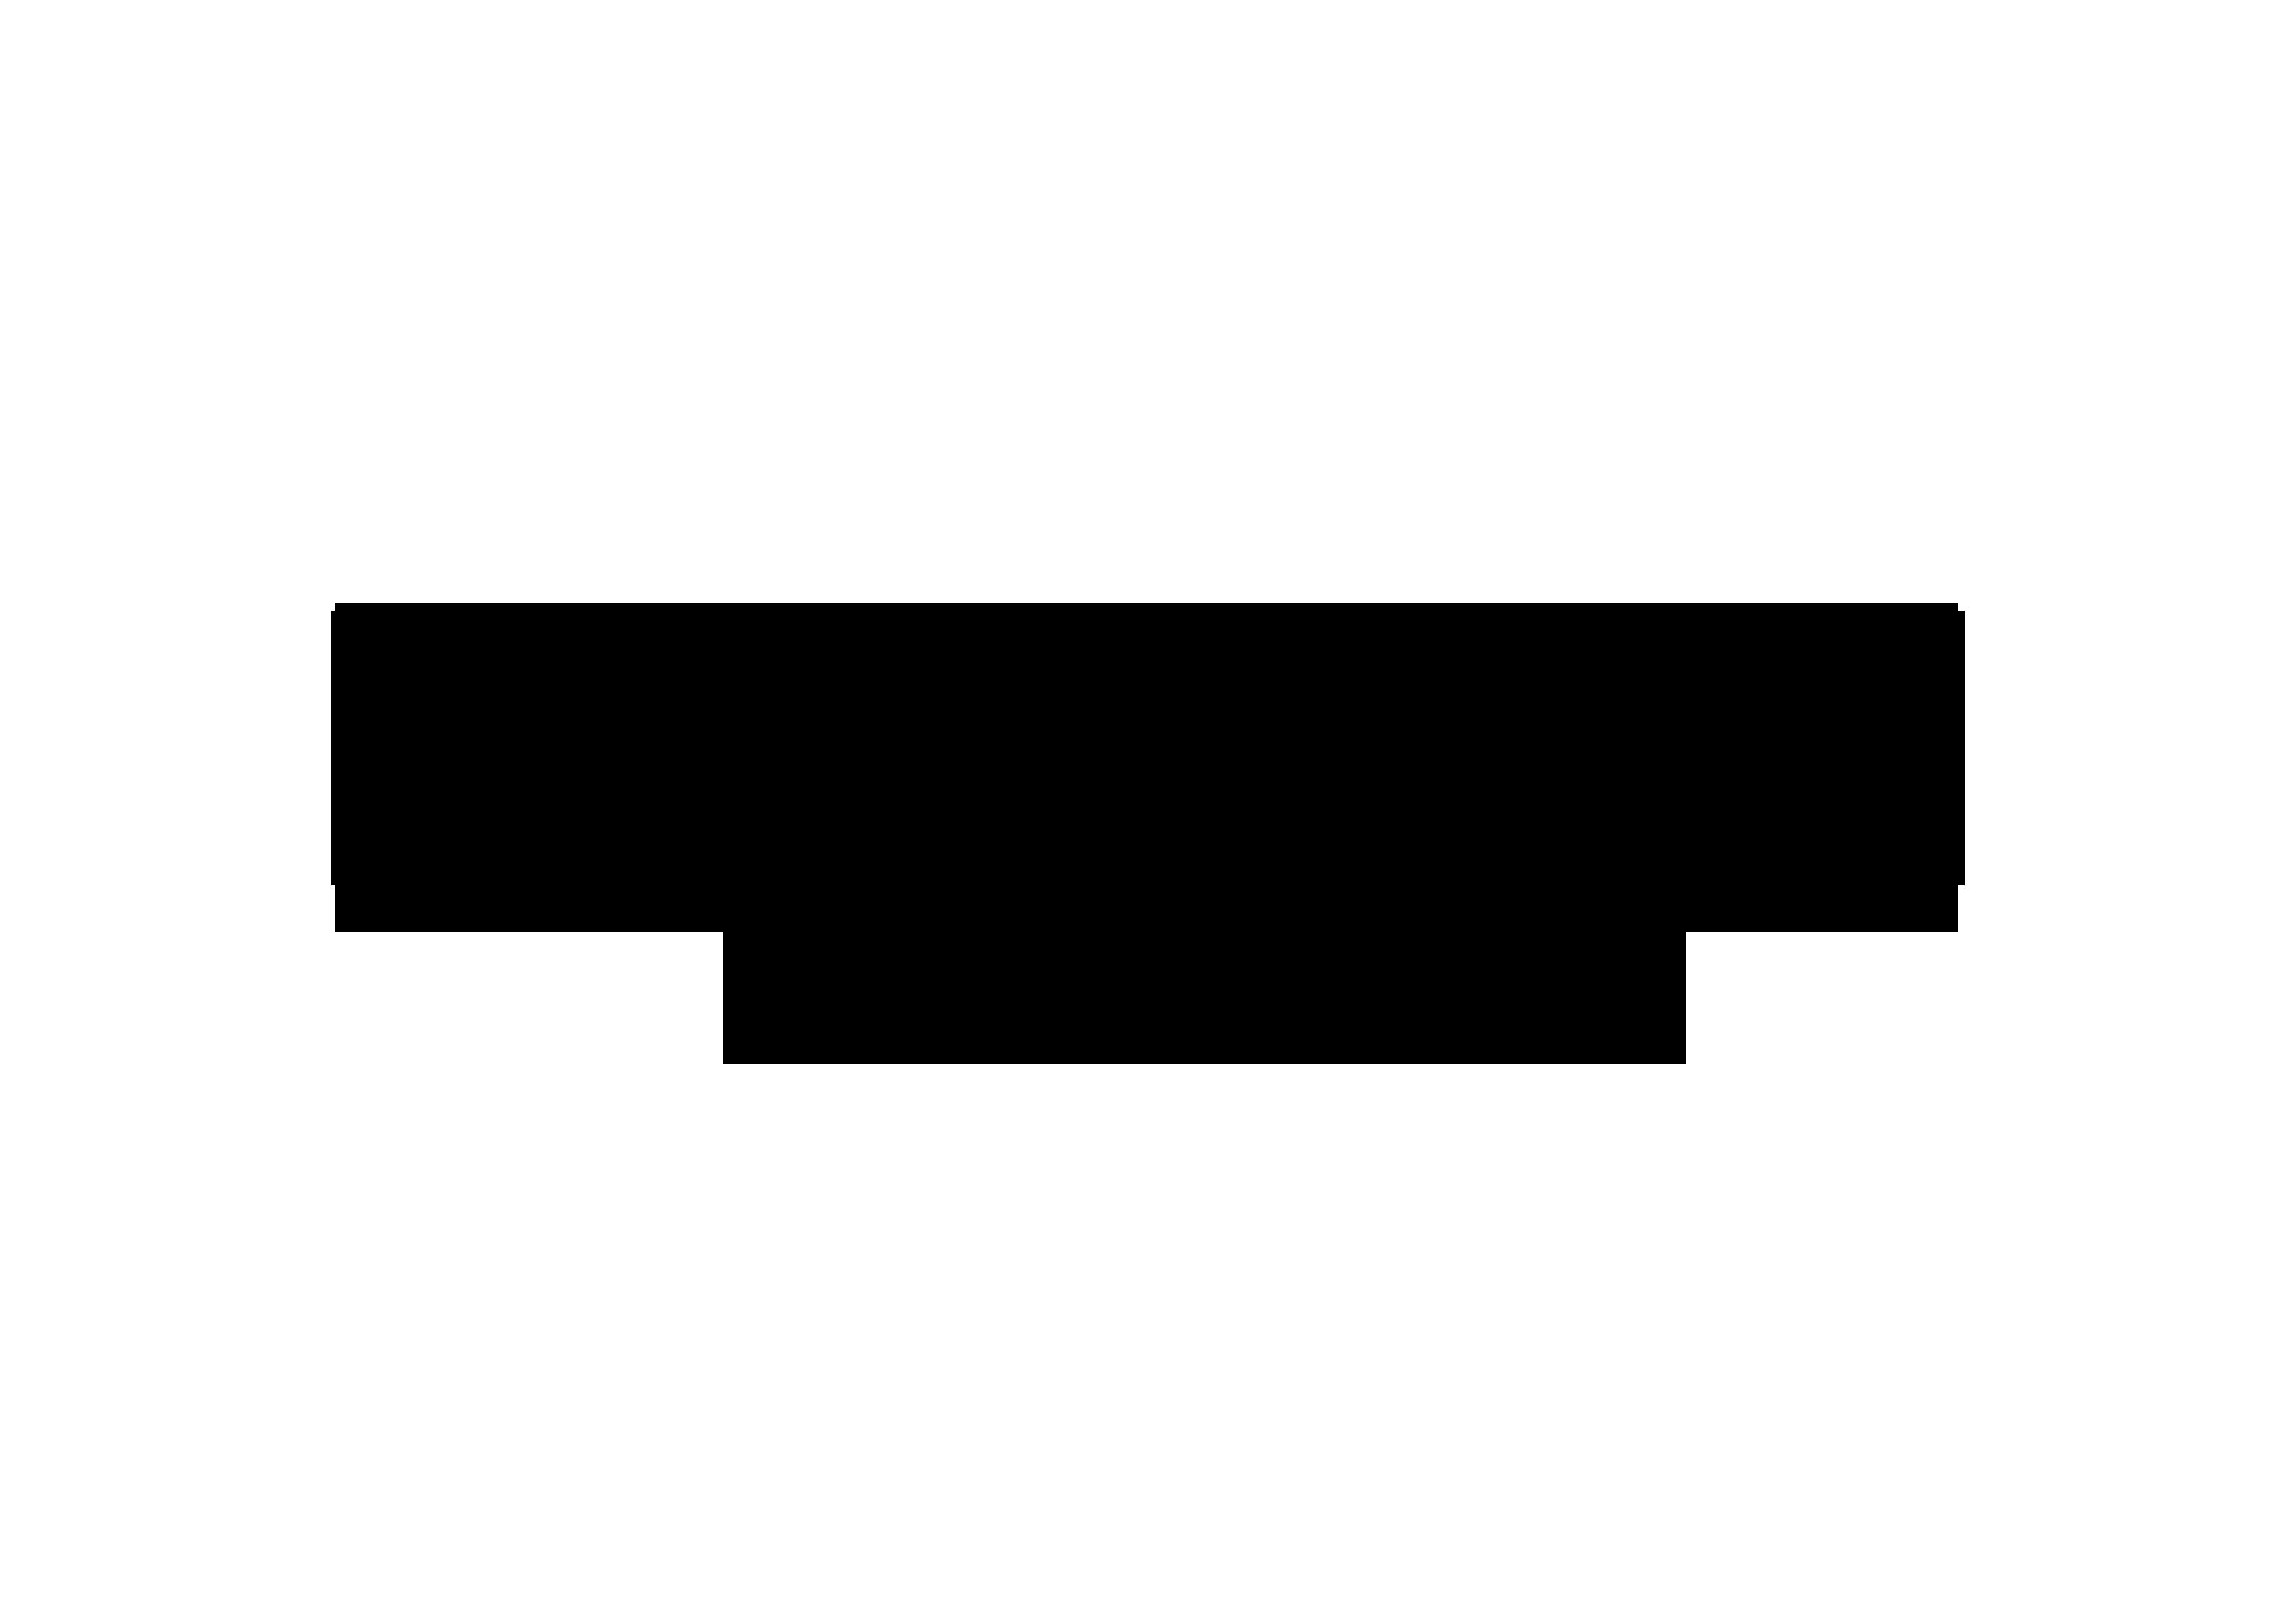 Lagoon_vector_logo-black.png